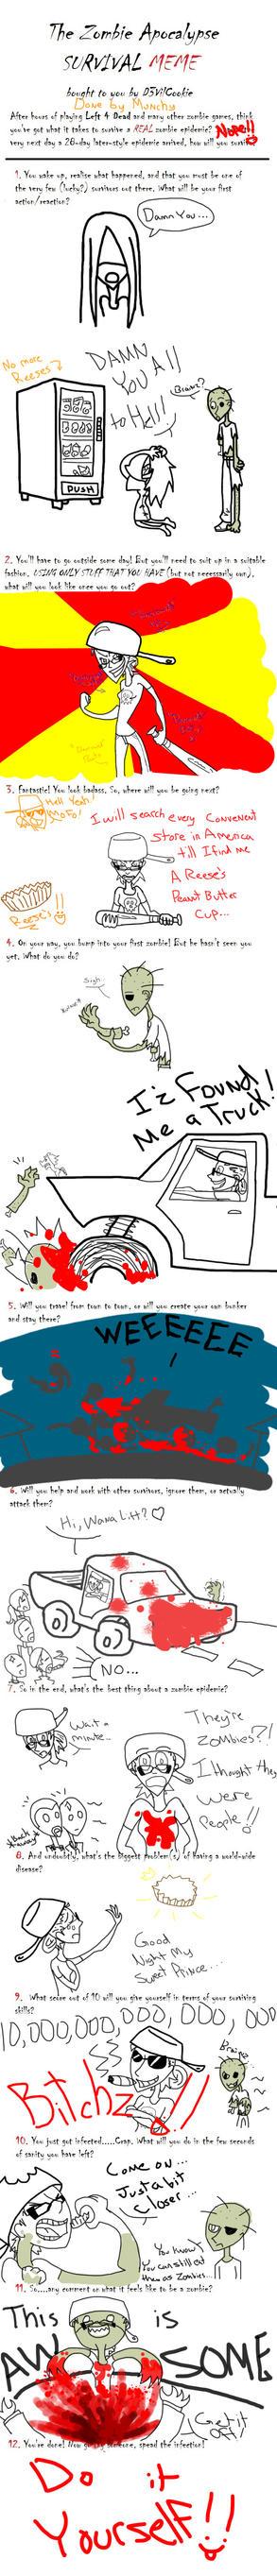 Zombie Apocalypse Meme by M-u-n-c-h-y